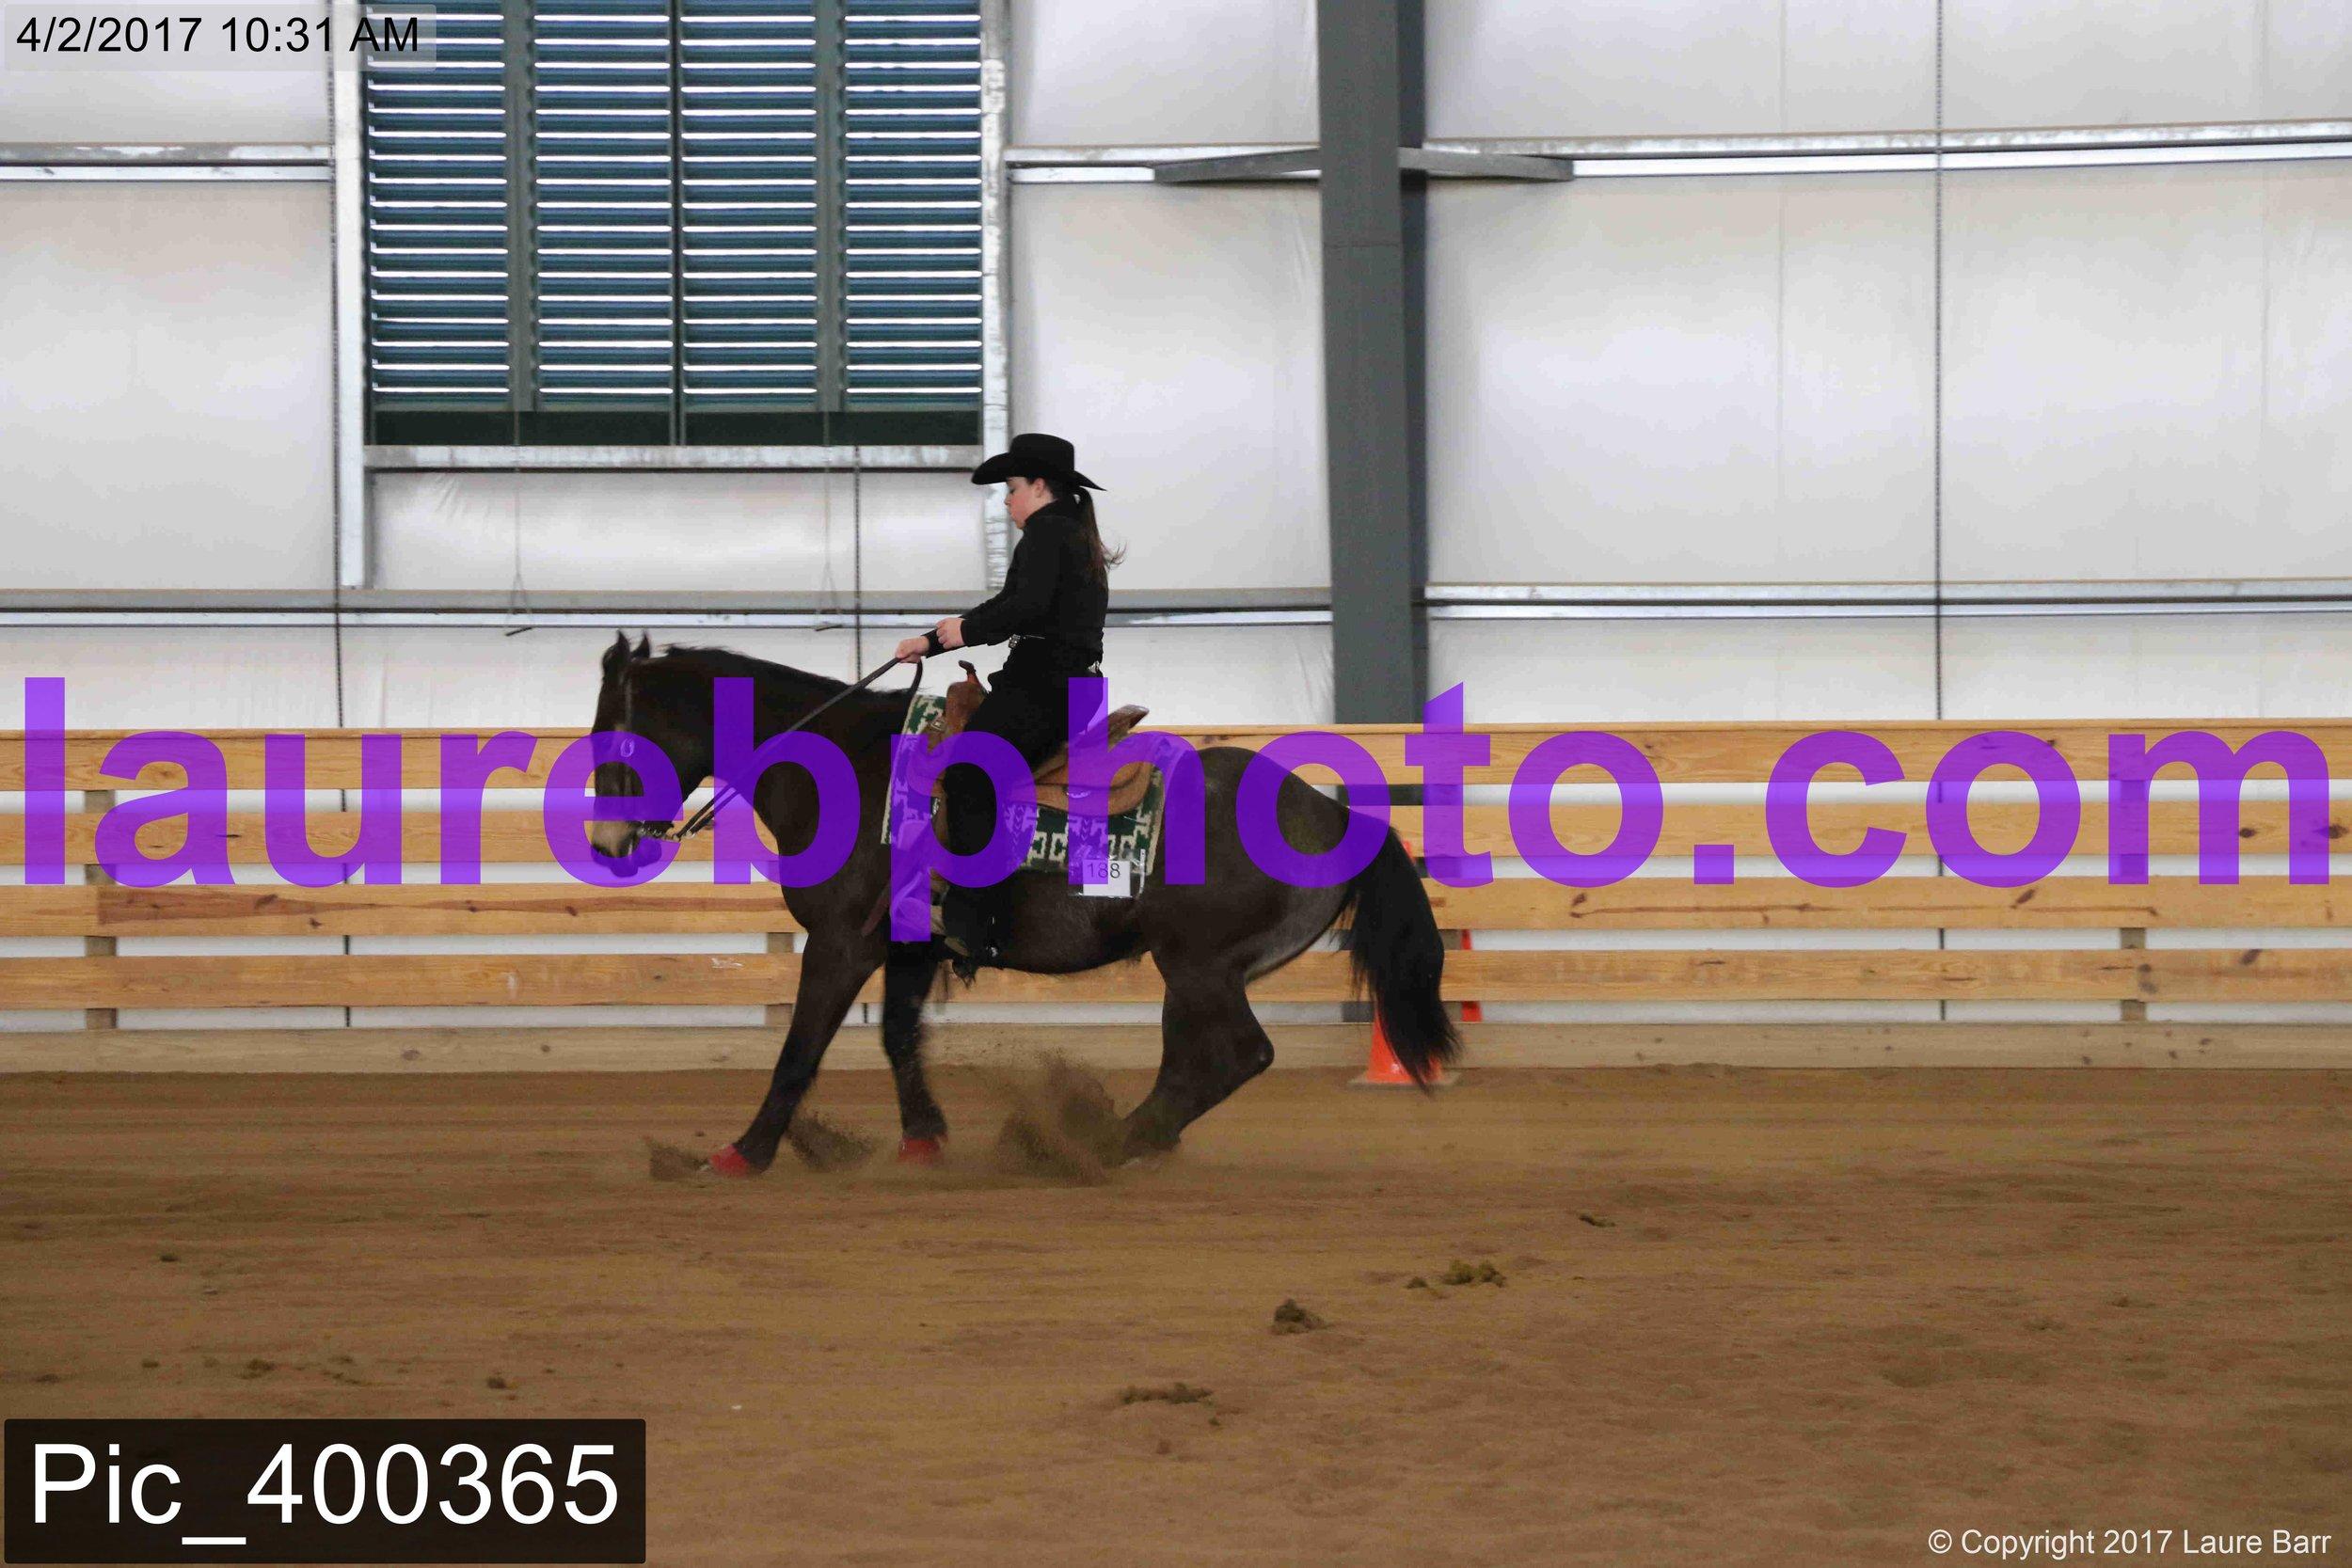 Pic_400365.jpg